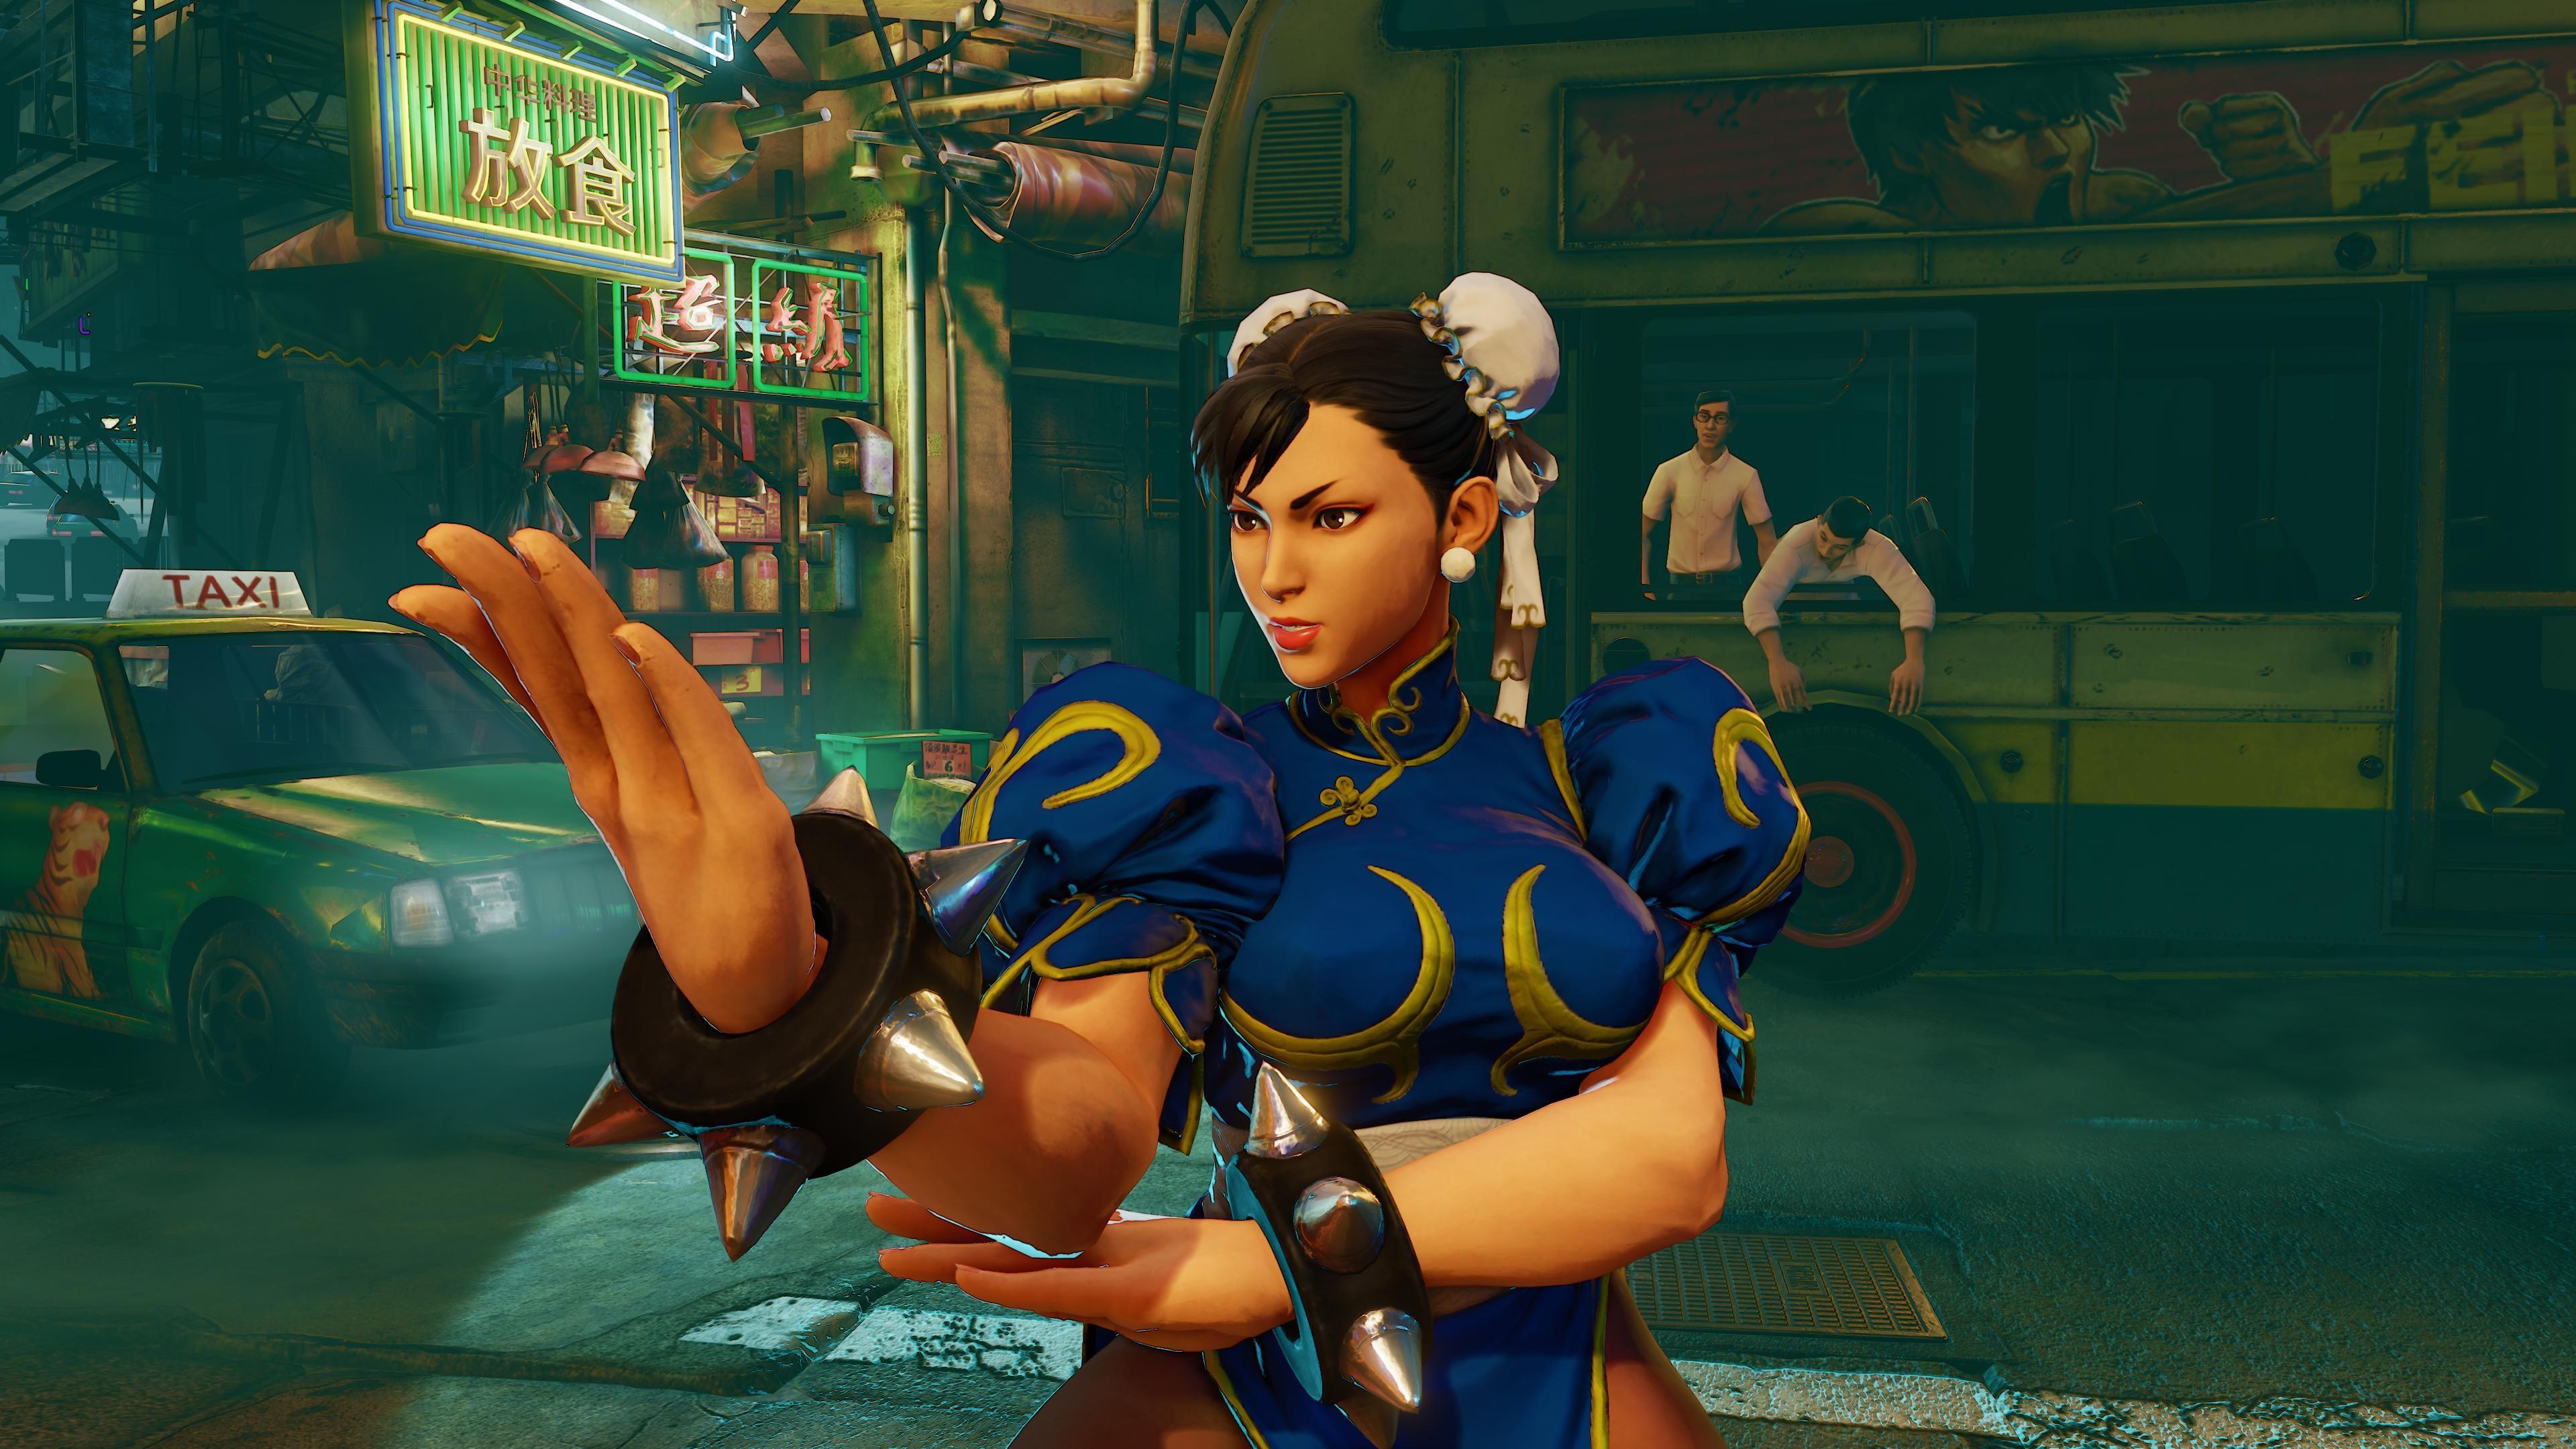 Wallpaper Street Fighter 5 Chun Li Best Games Fantasy Pc Ps4